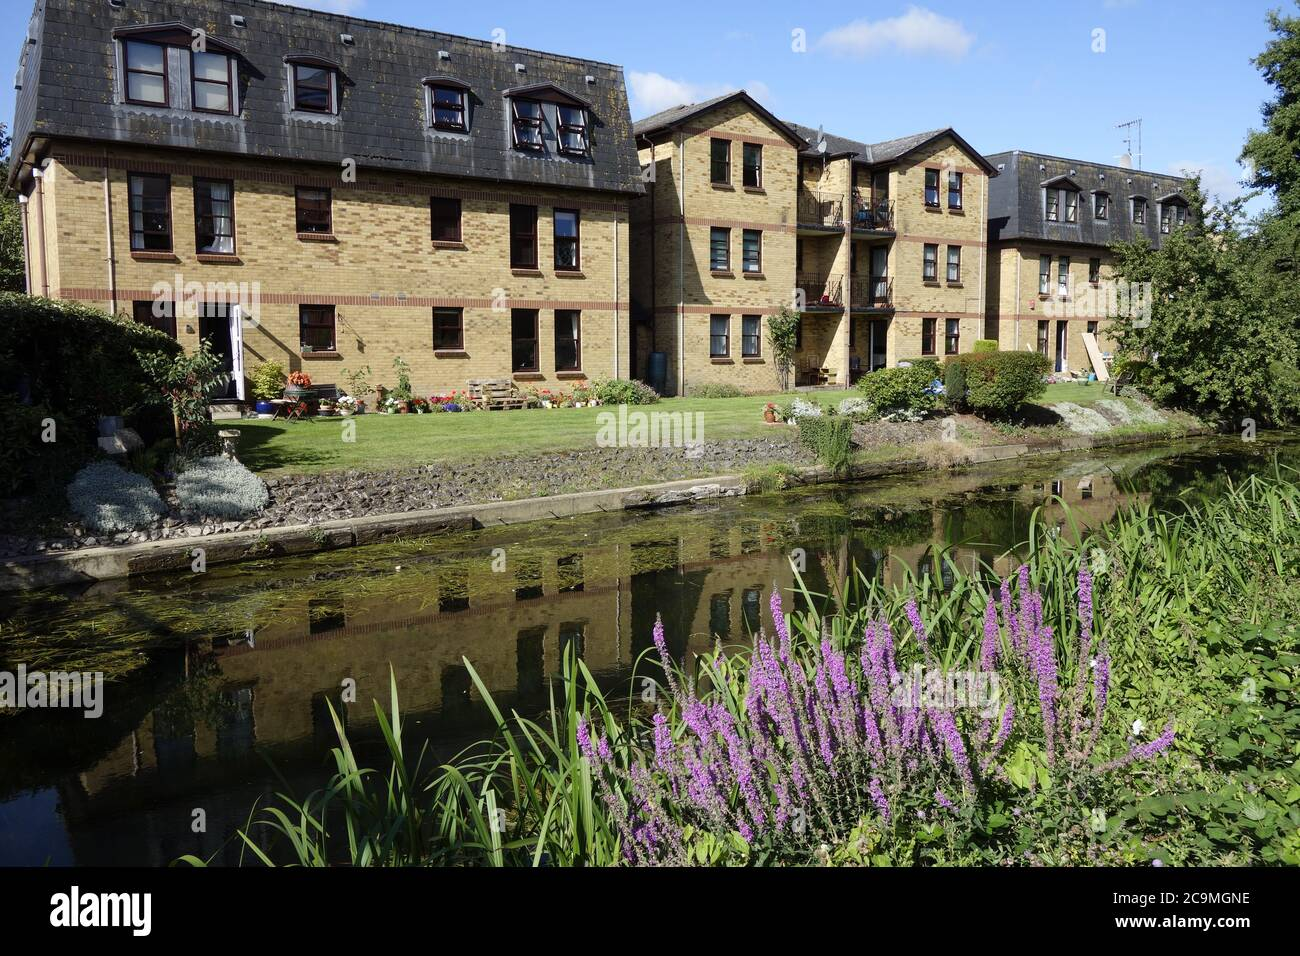 bishops stortford river stort canal walk, stort navigation, canal trust, quaint market town hertfordshire england uk great britain Stock Photo